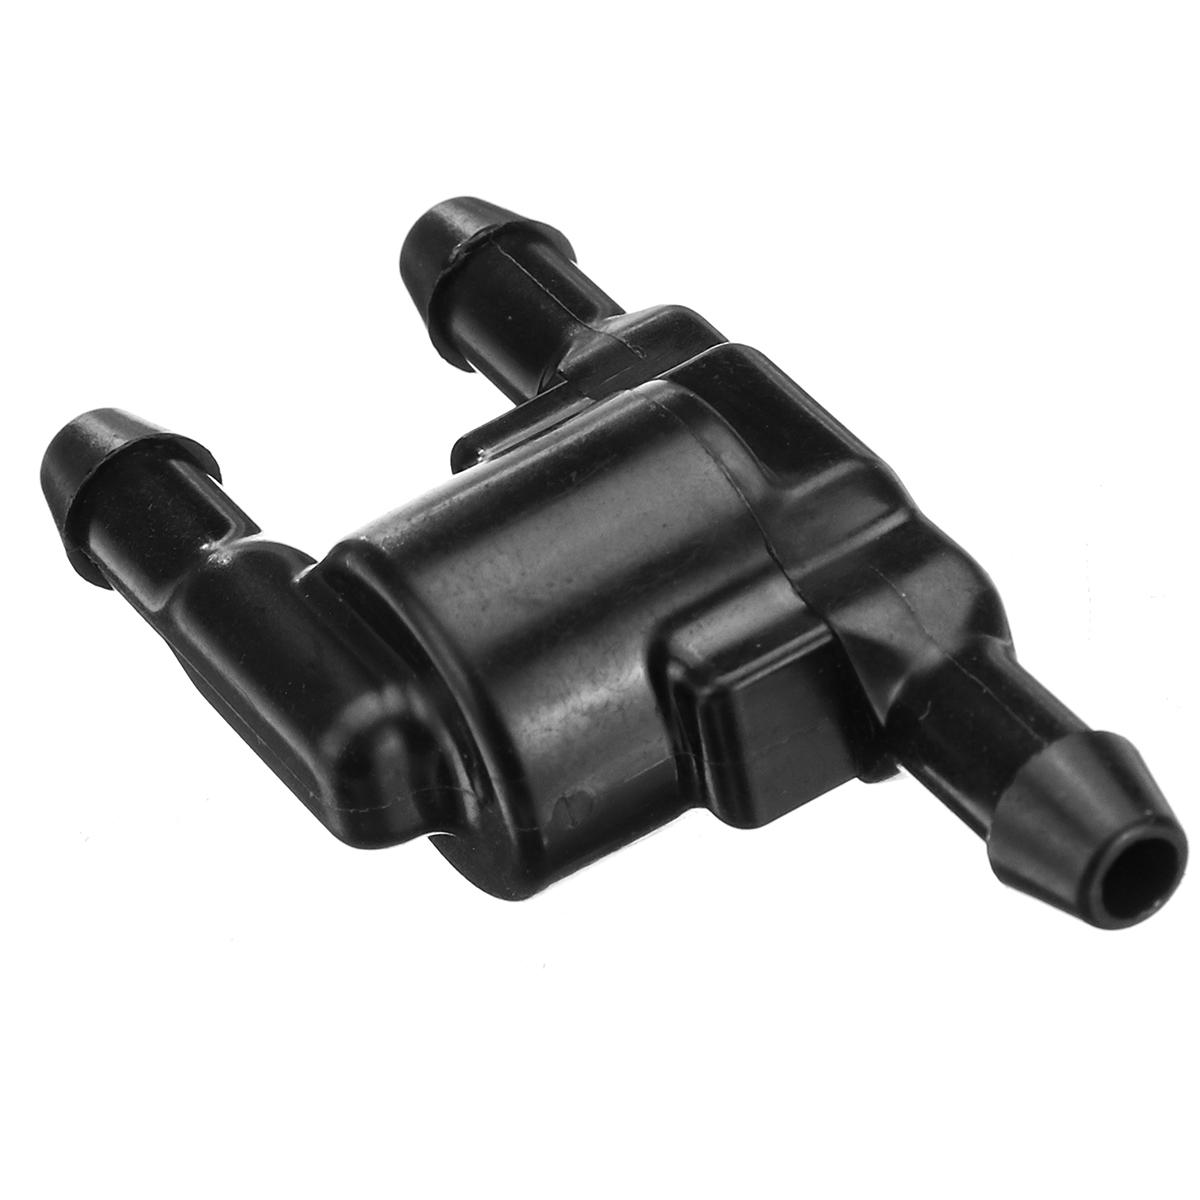 Boquilla de rociado de agua del limpiaparabrisas del limpiaparabrisas para Toyota Corolla Scion 8532128020 85321-28020